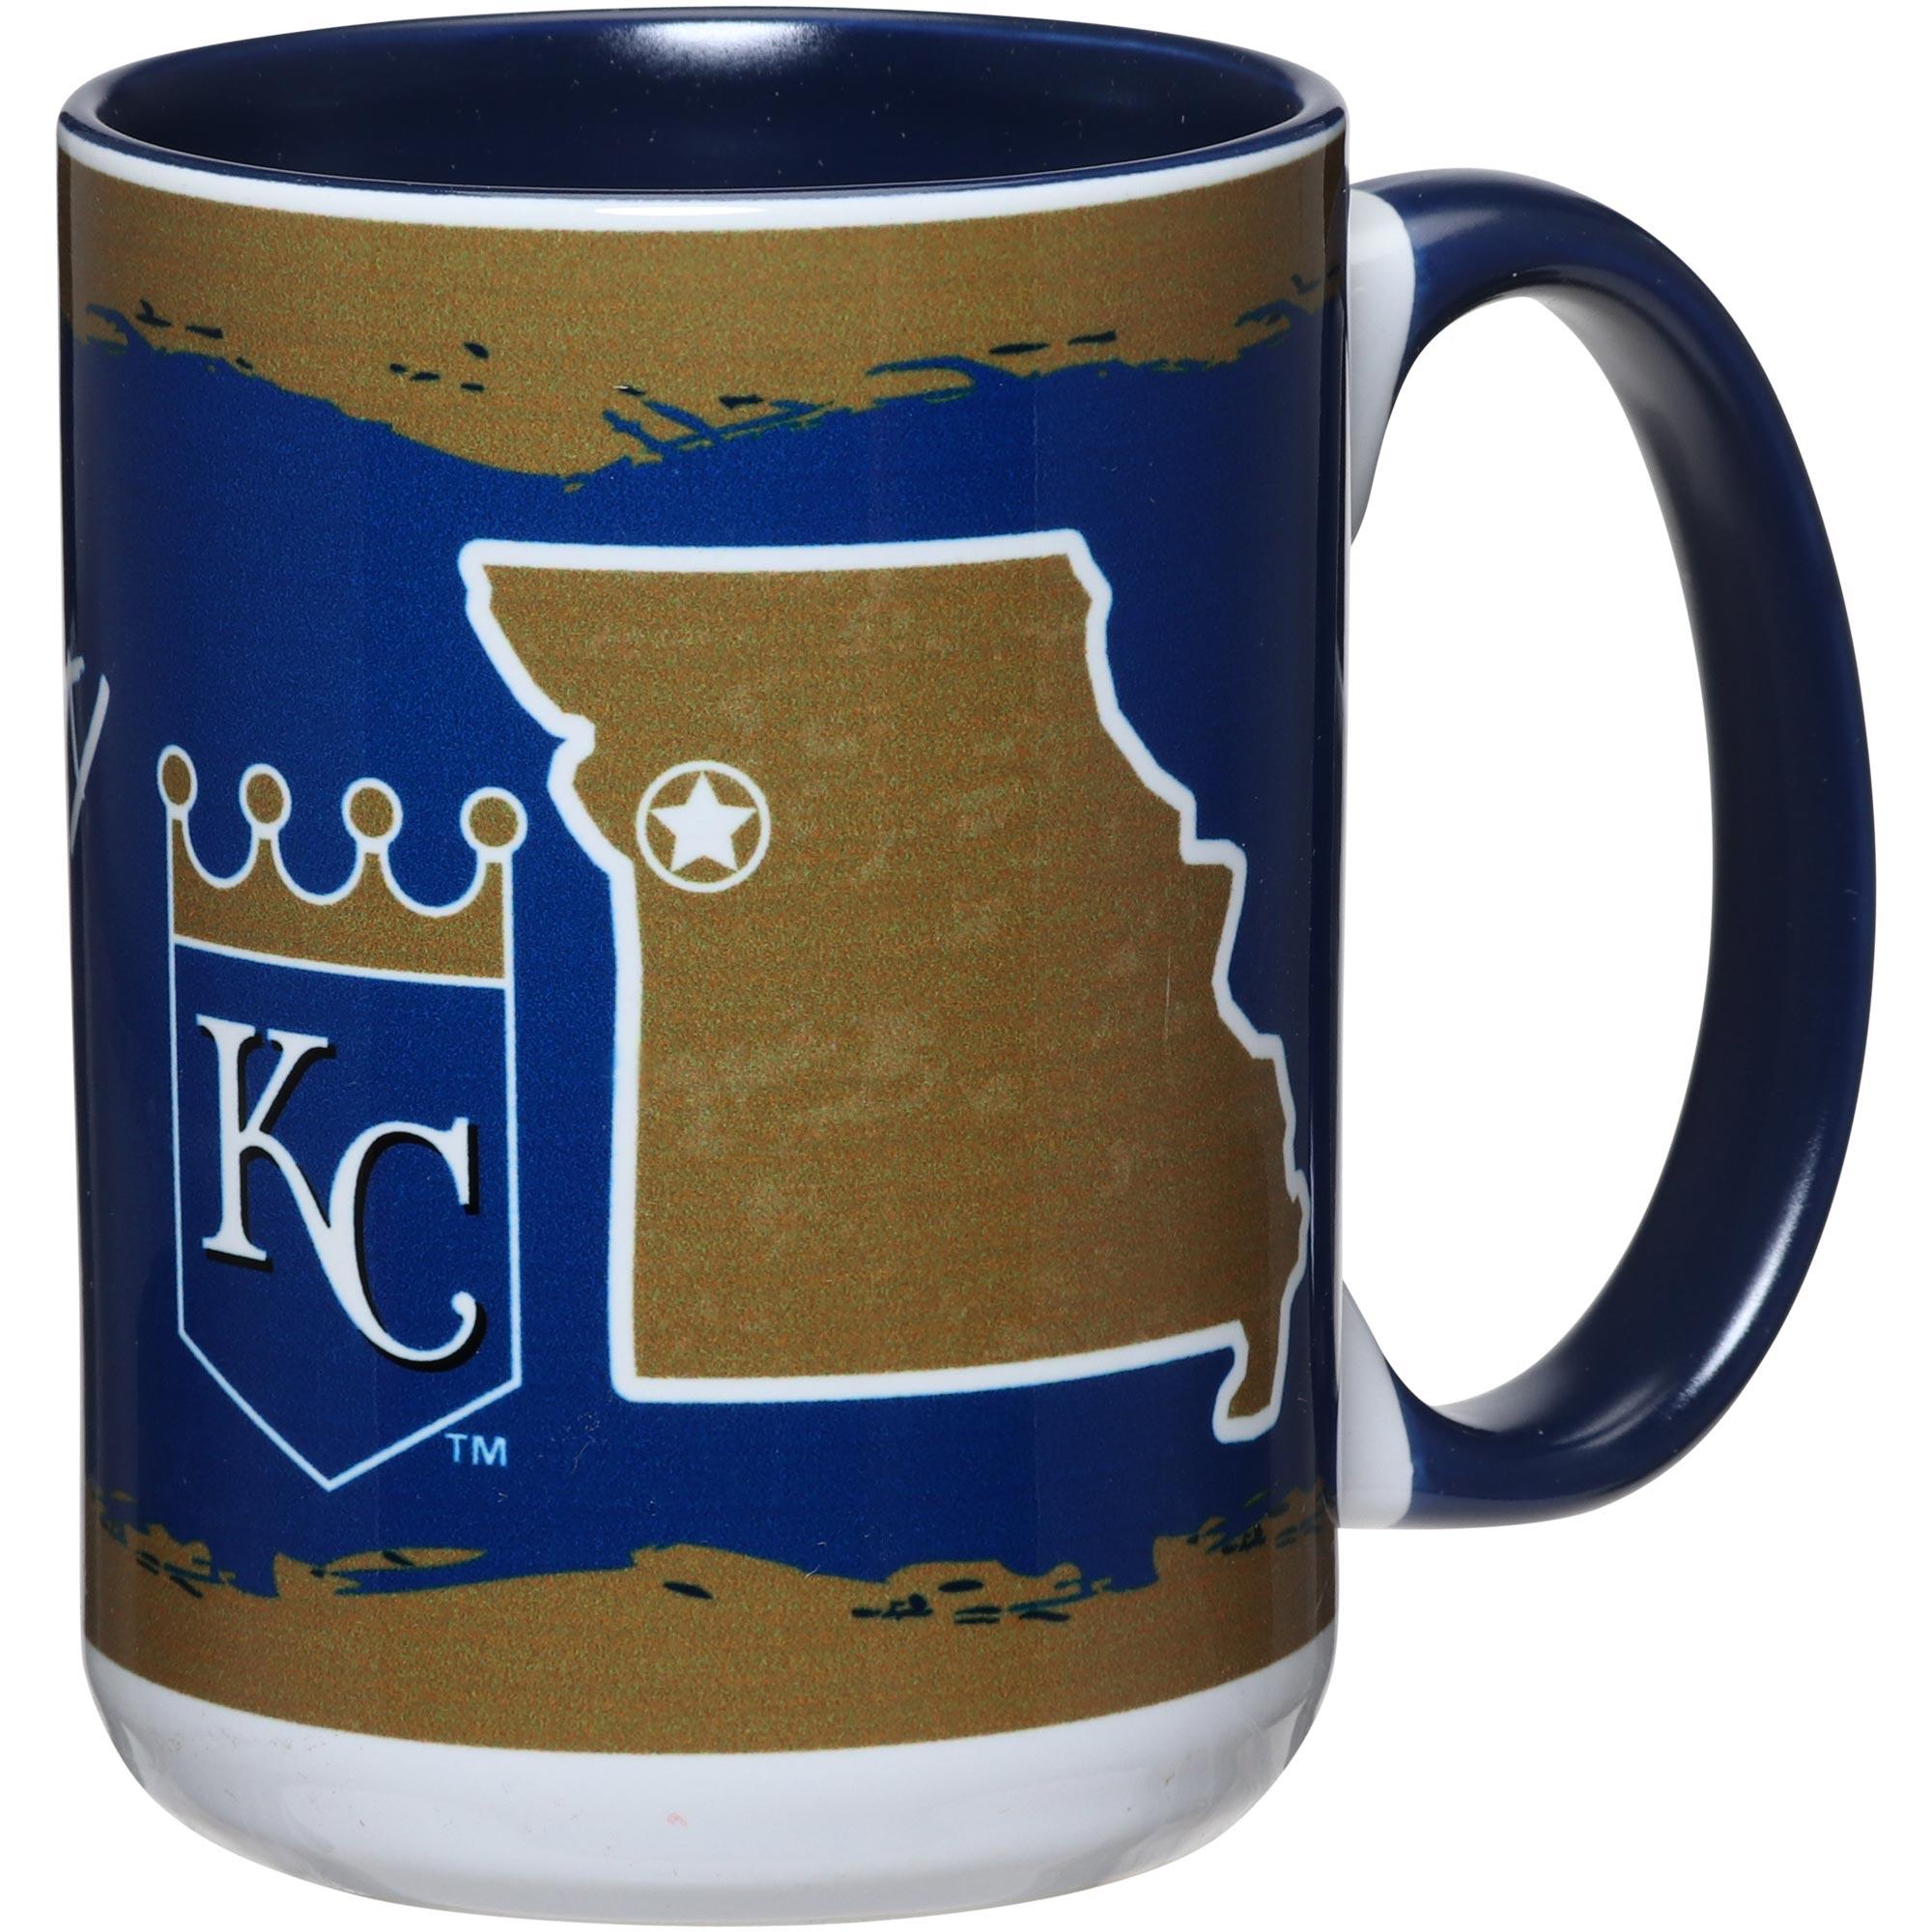 Kansas City Royals 15oz. It's Your State Of Mind Mug - No Size